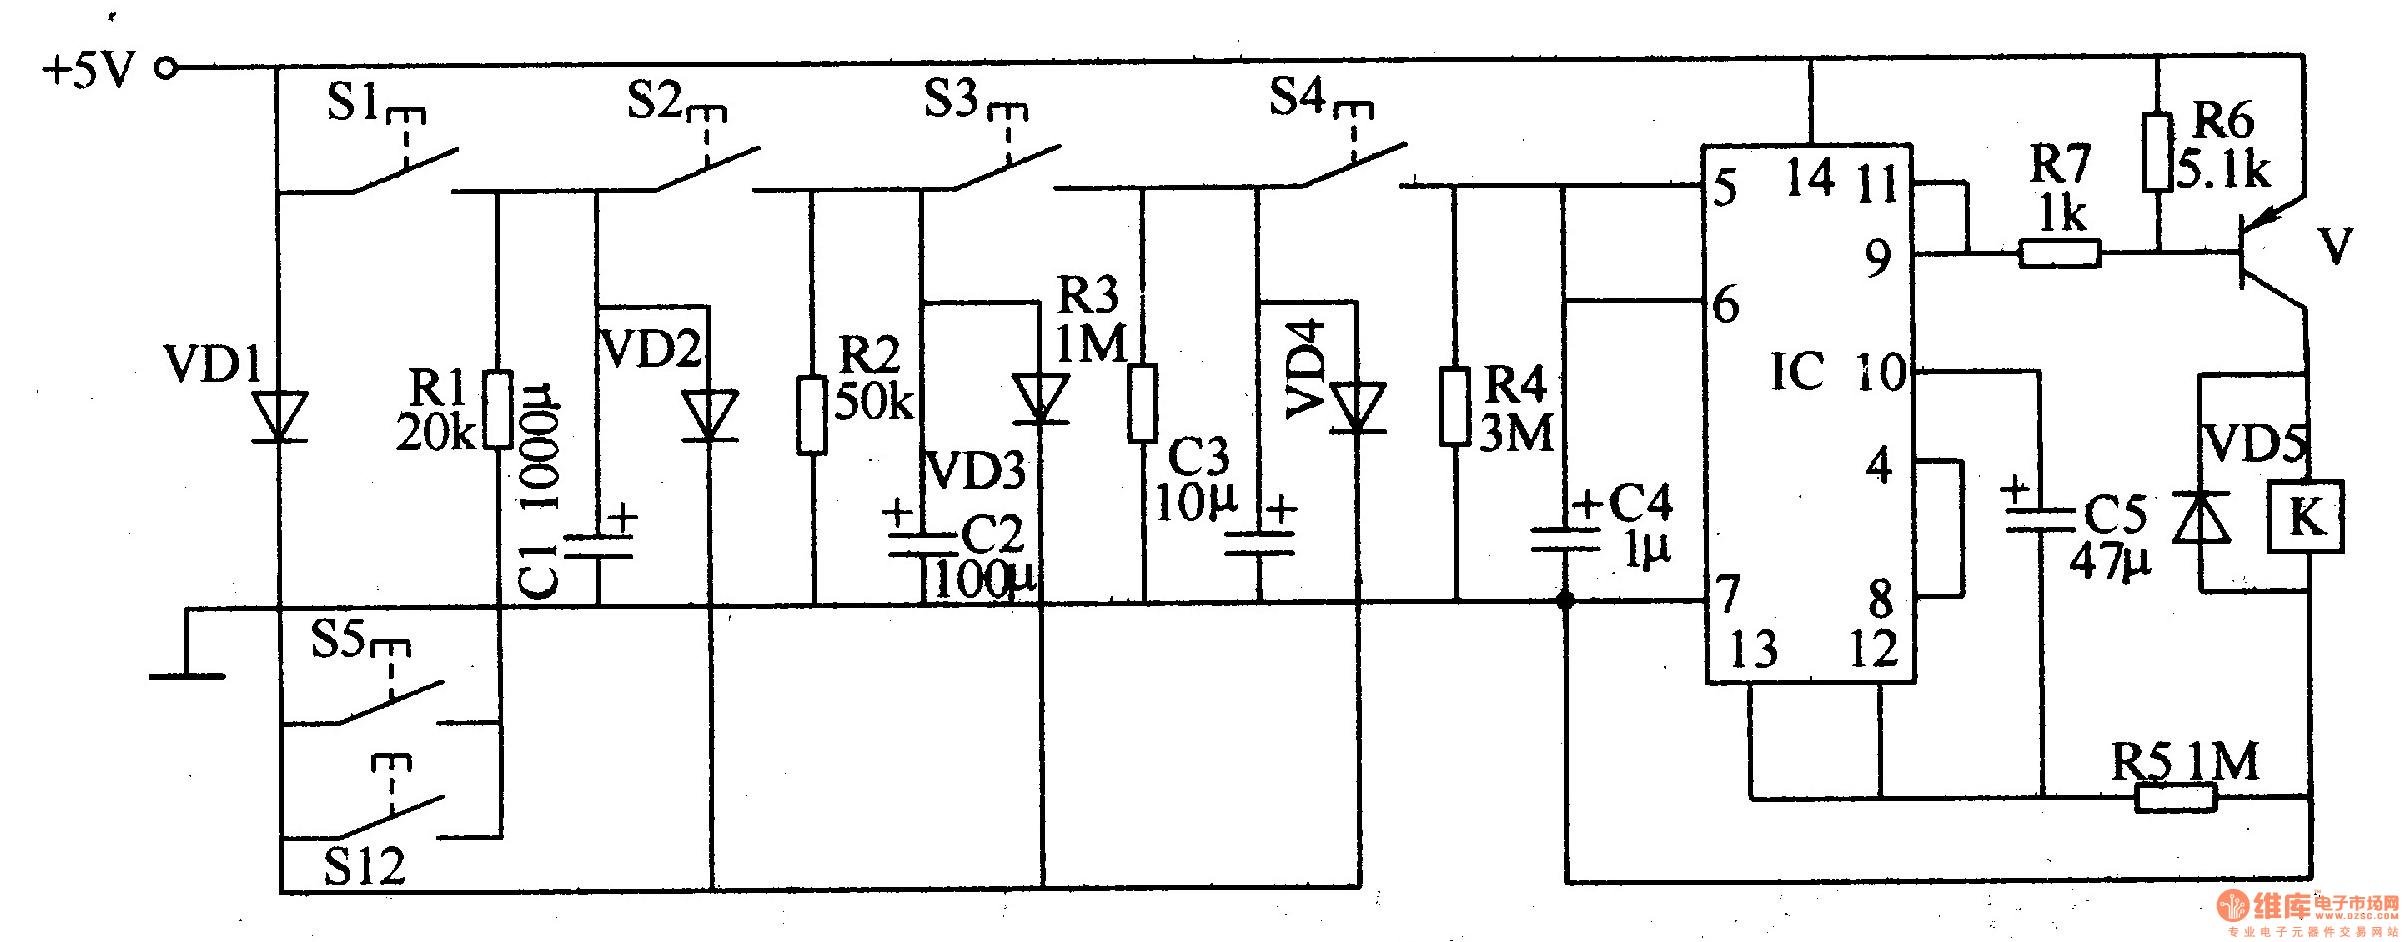 electronic password switch 2 - electrical equipment circuit - circuit diagram